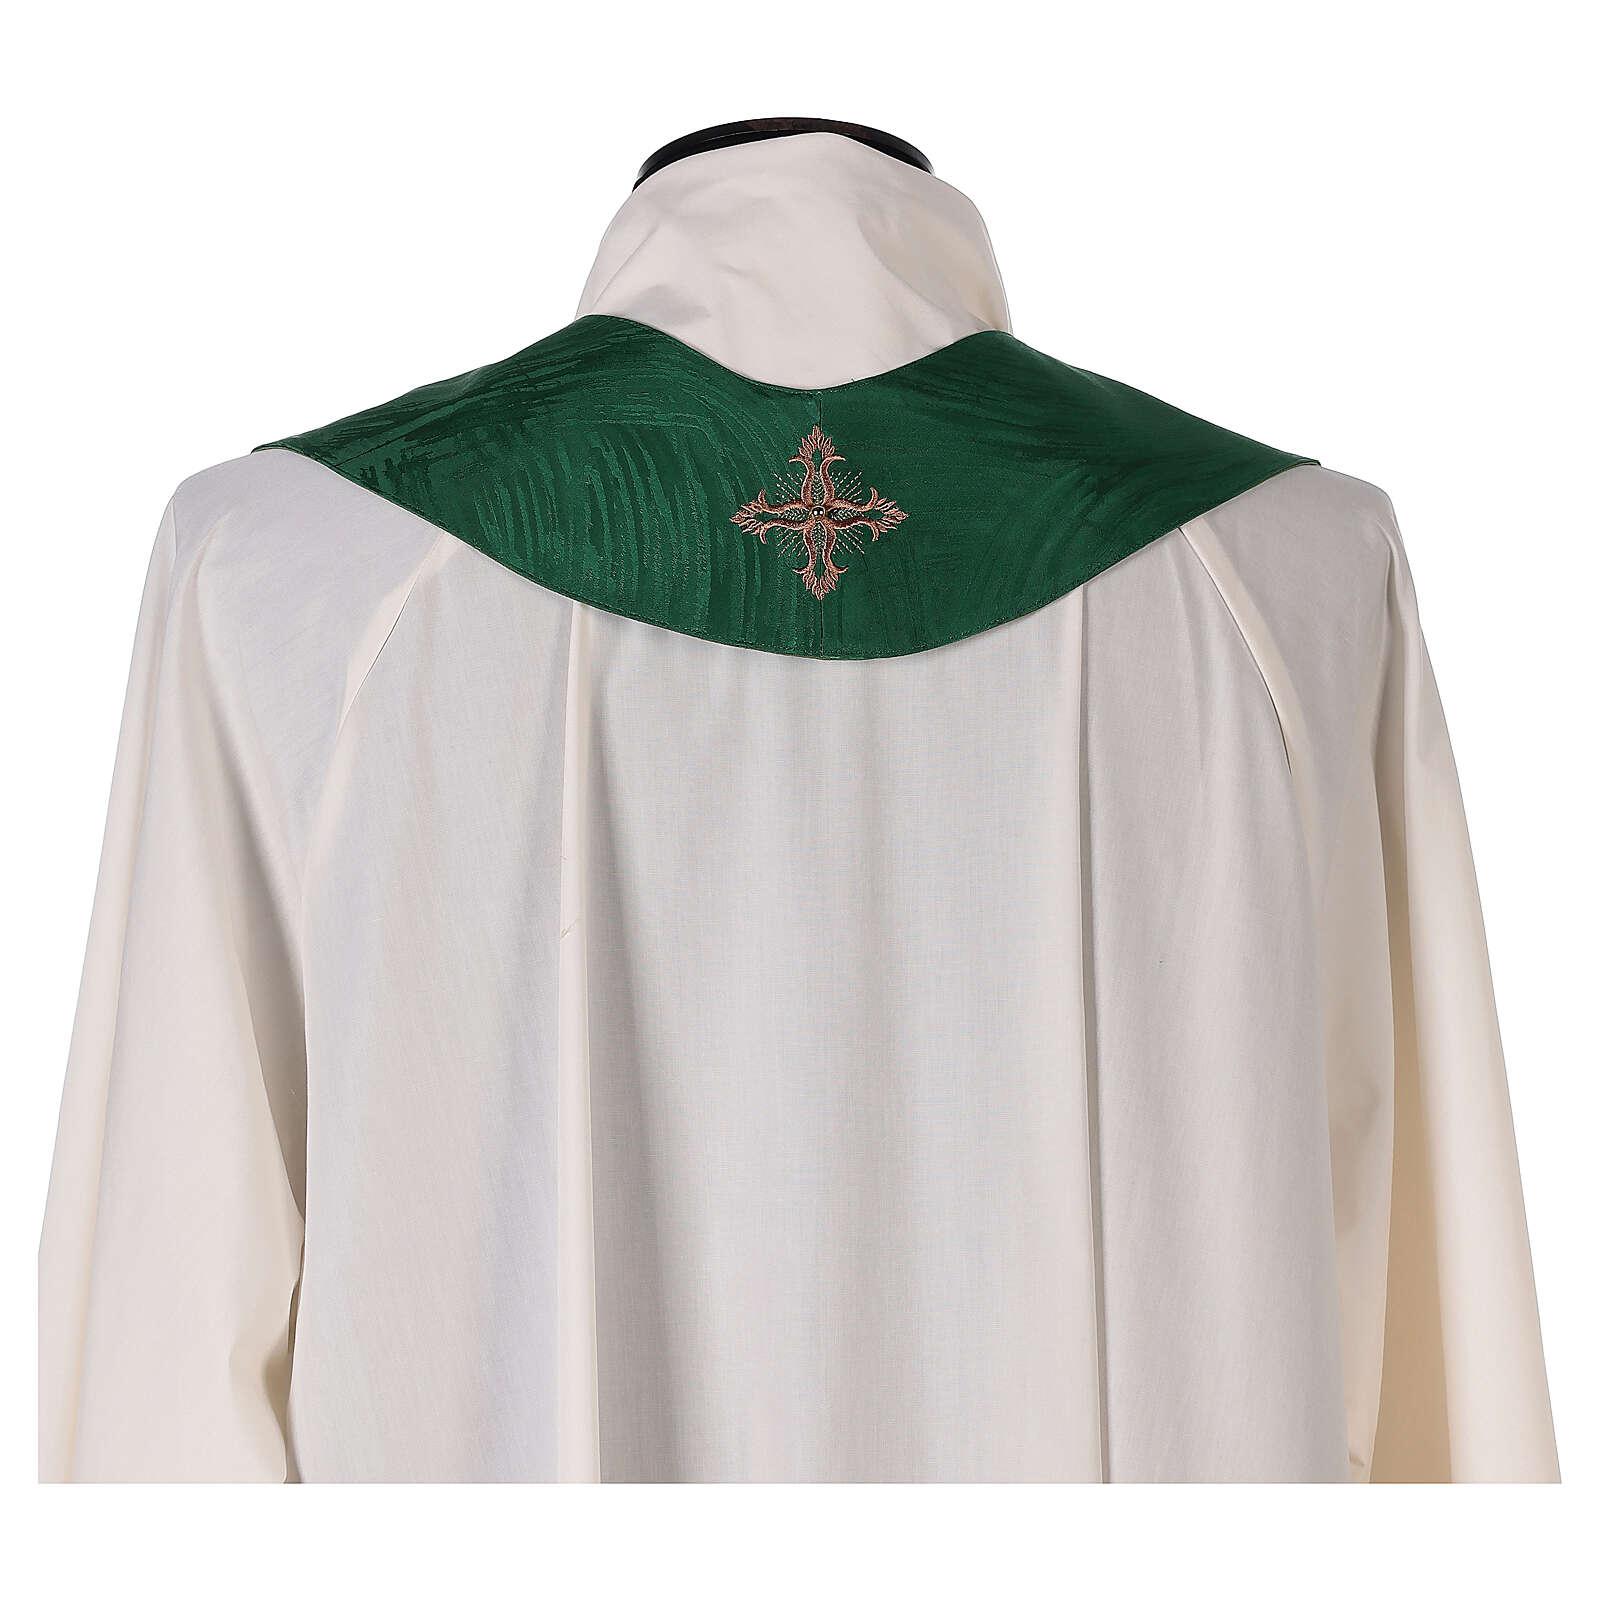 Priest chasuble in acetate viscose agremanistitch work Swarovski machine embroidery 4